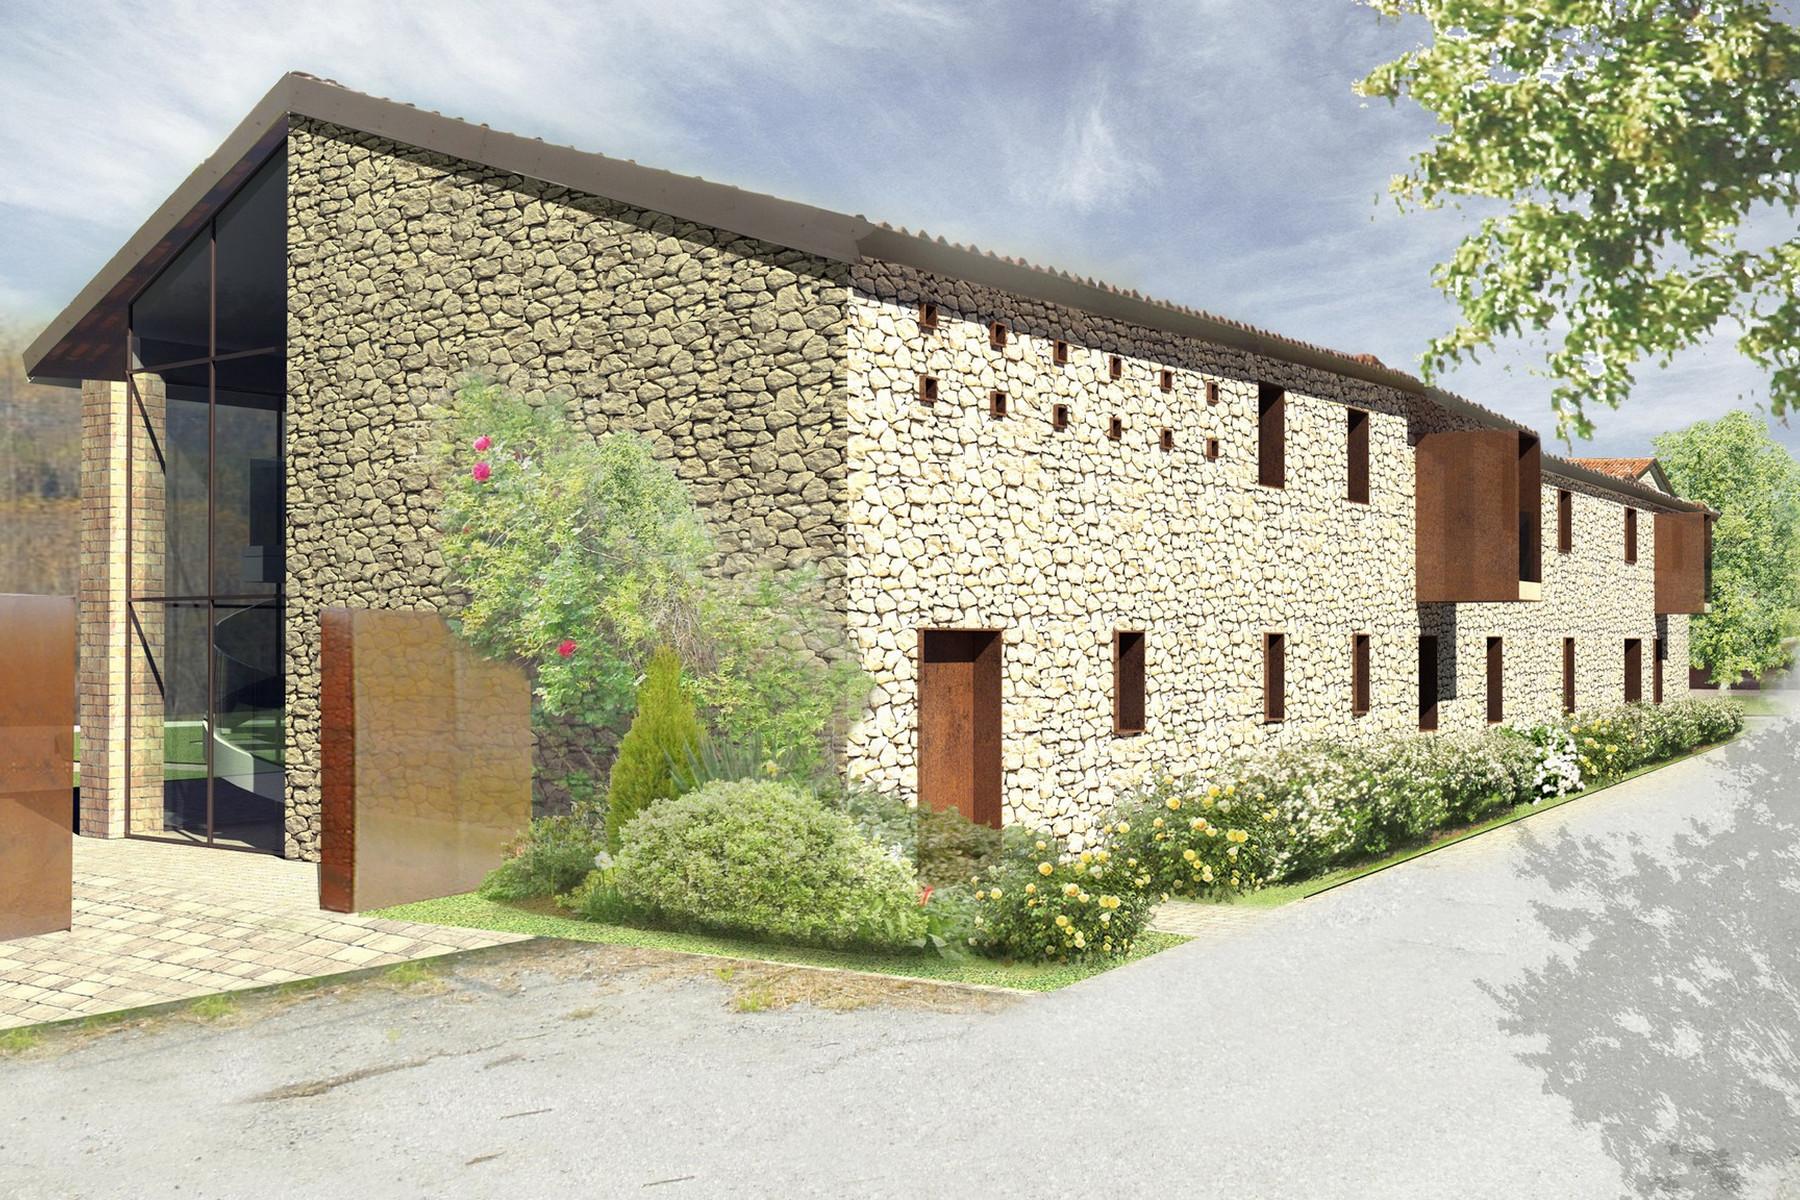 Villa in Vendita a Clavesana: 5 locali, 1130 mq - Foto 2